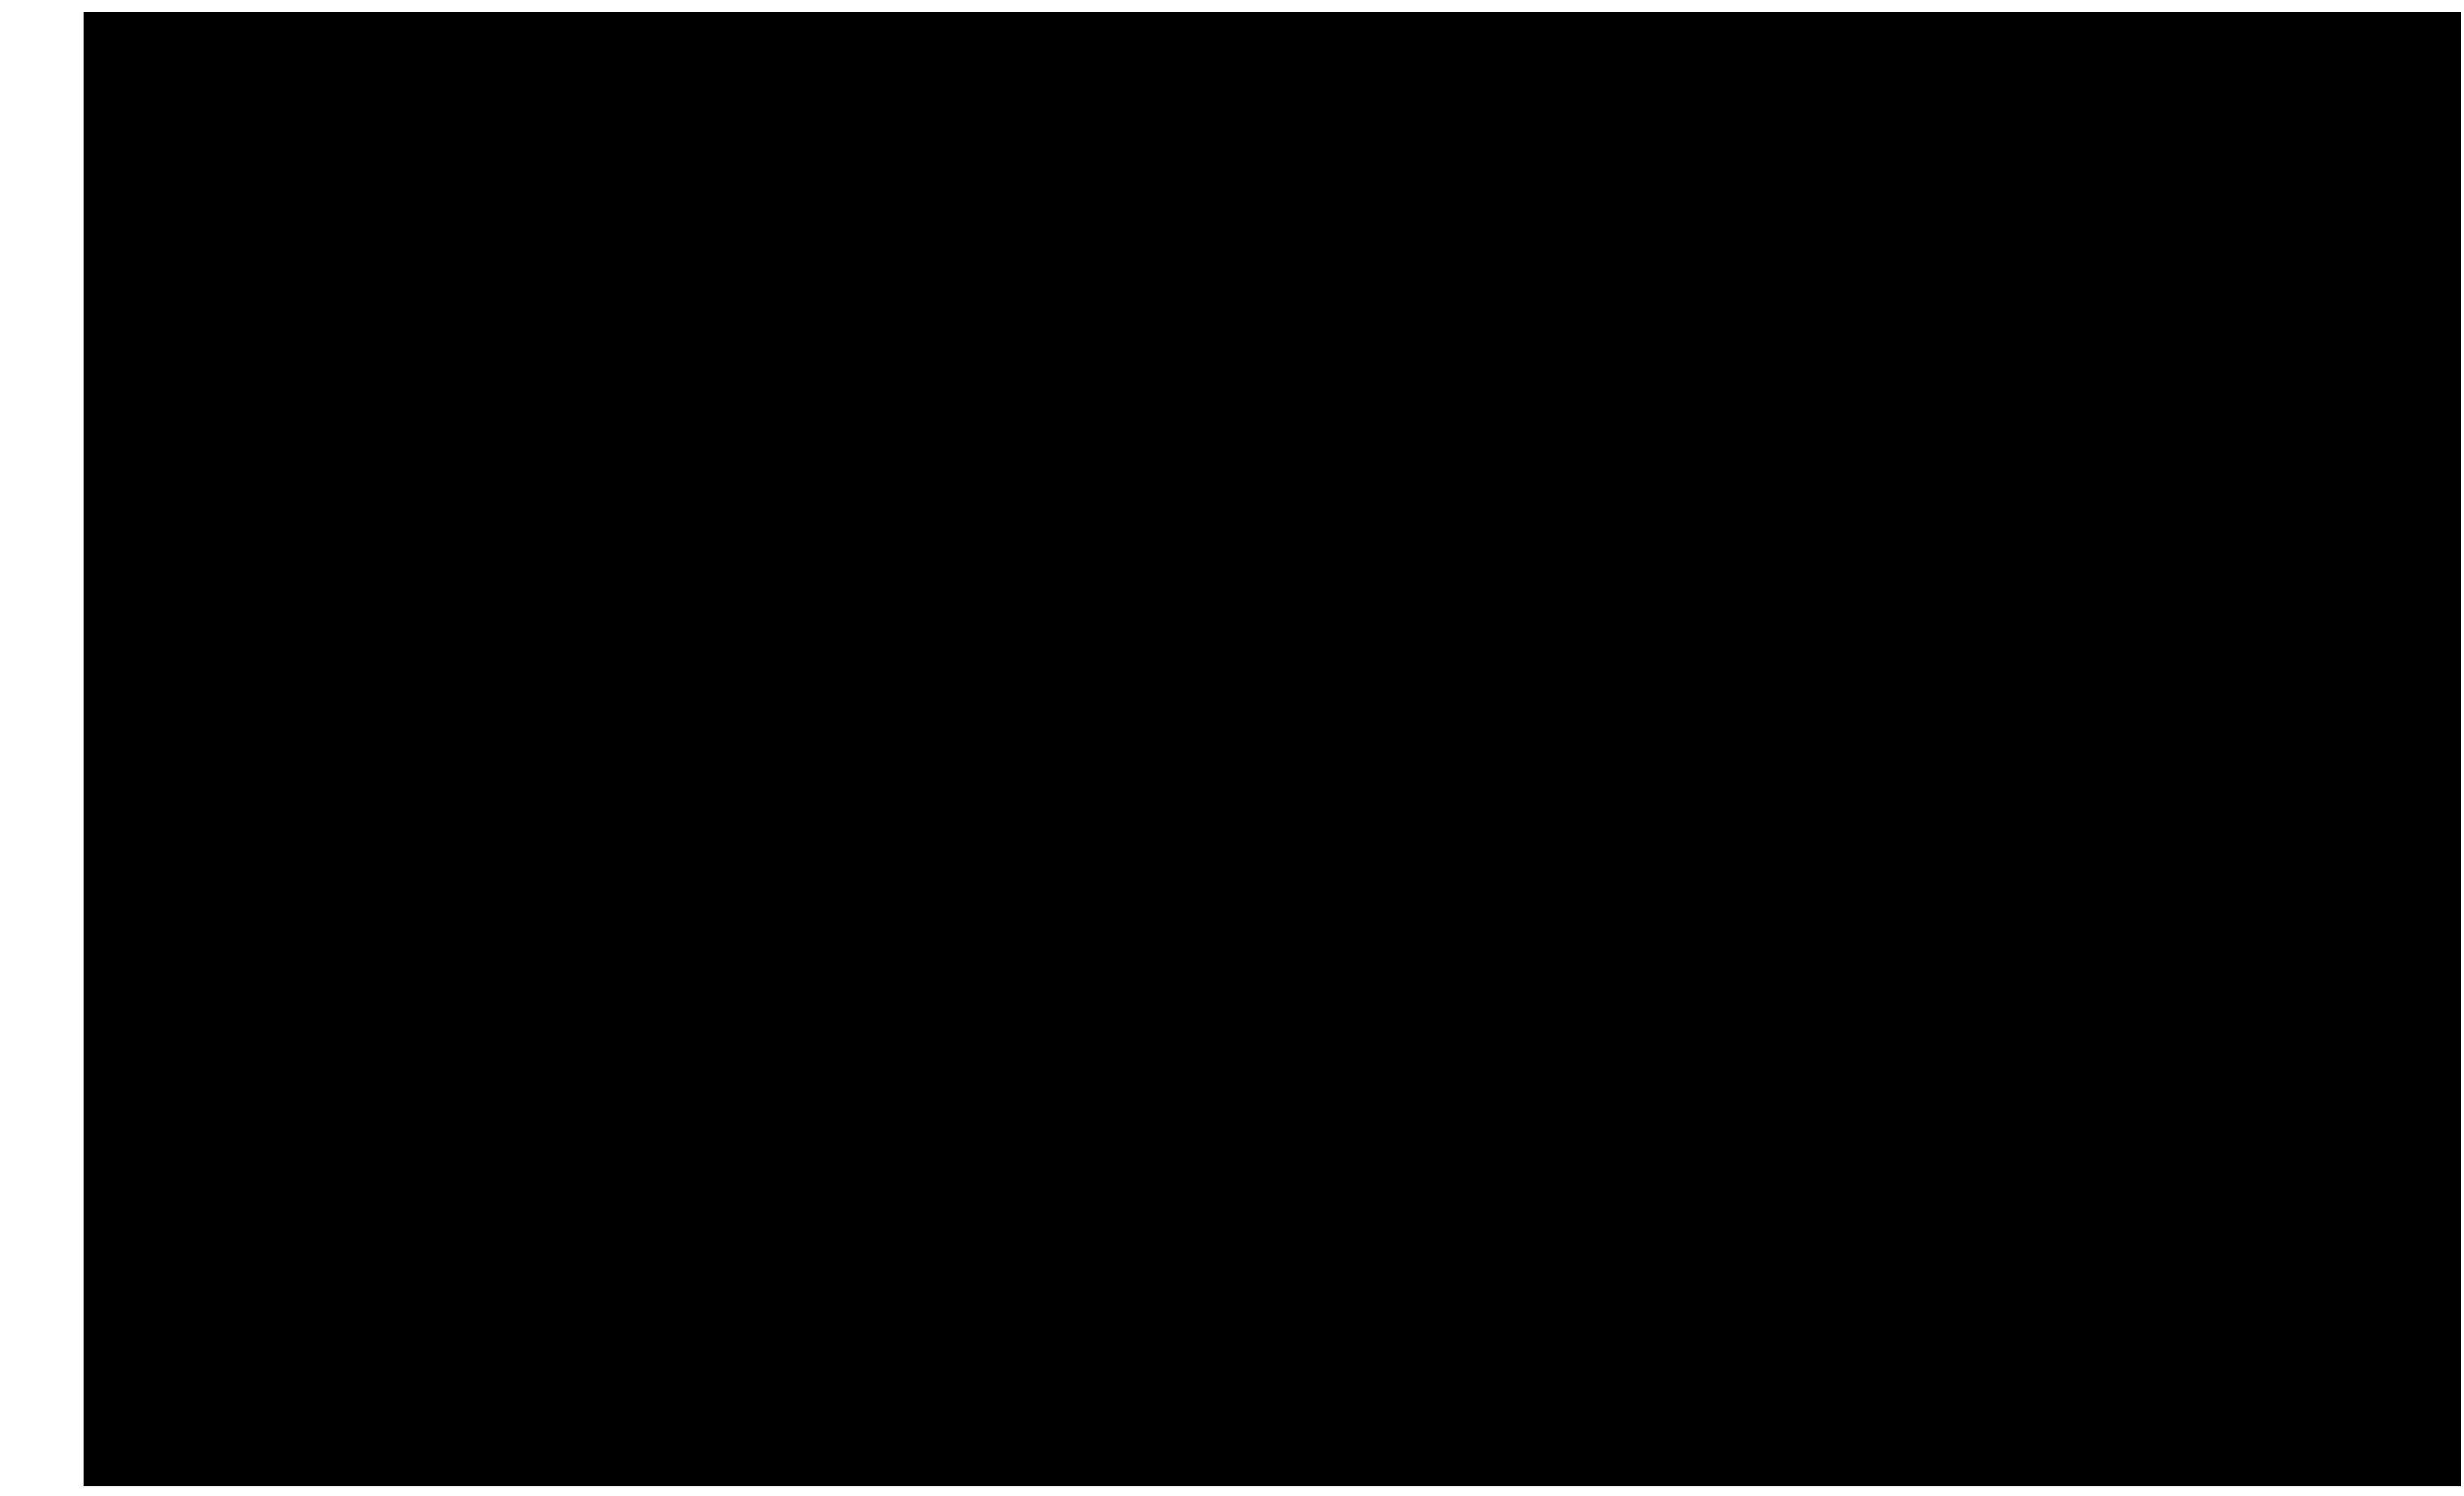 G140 LAYOUT 01